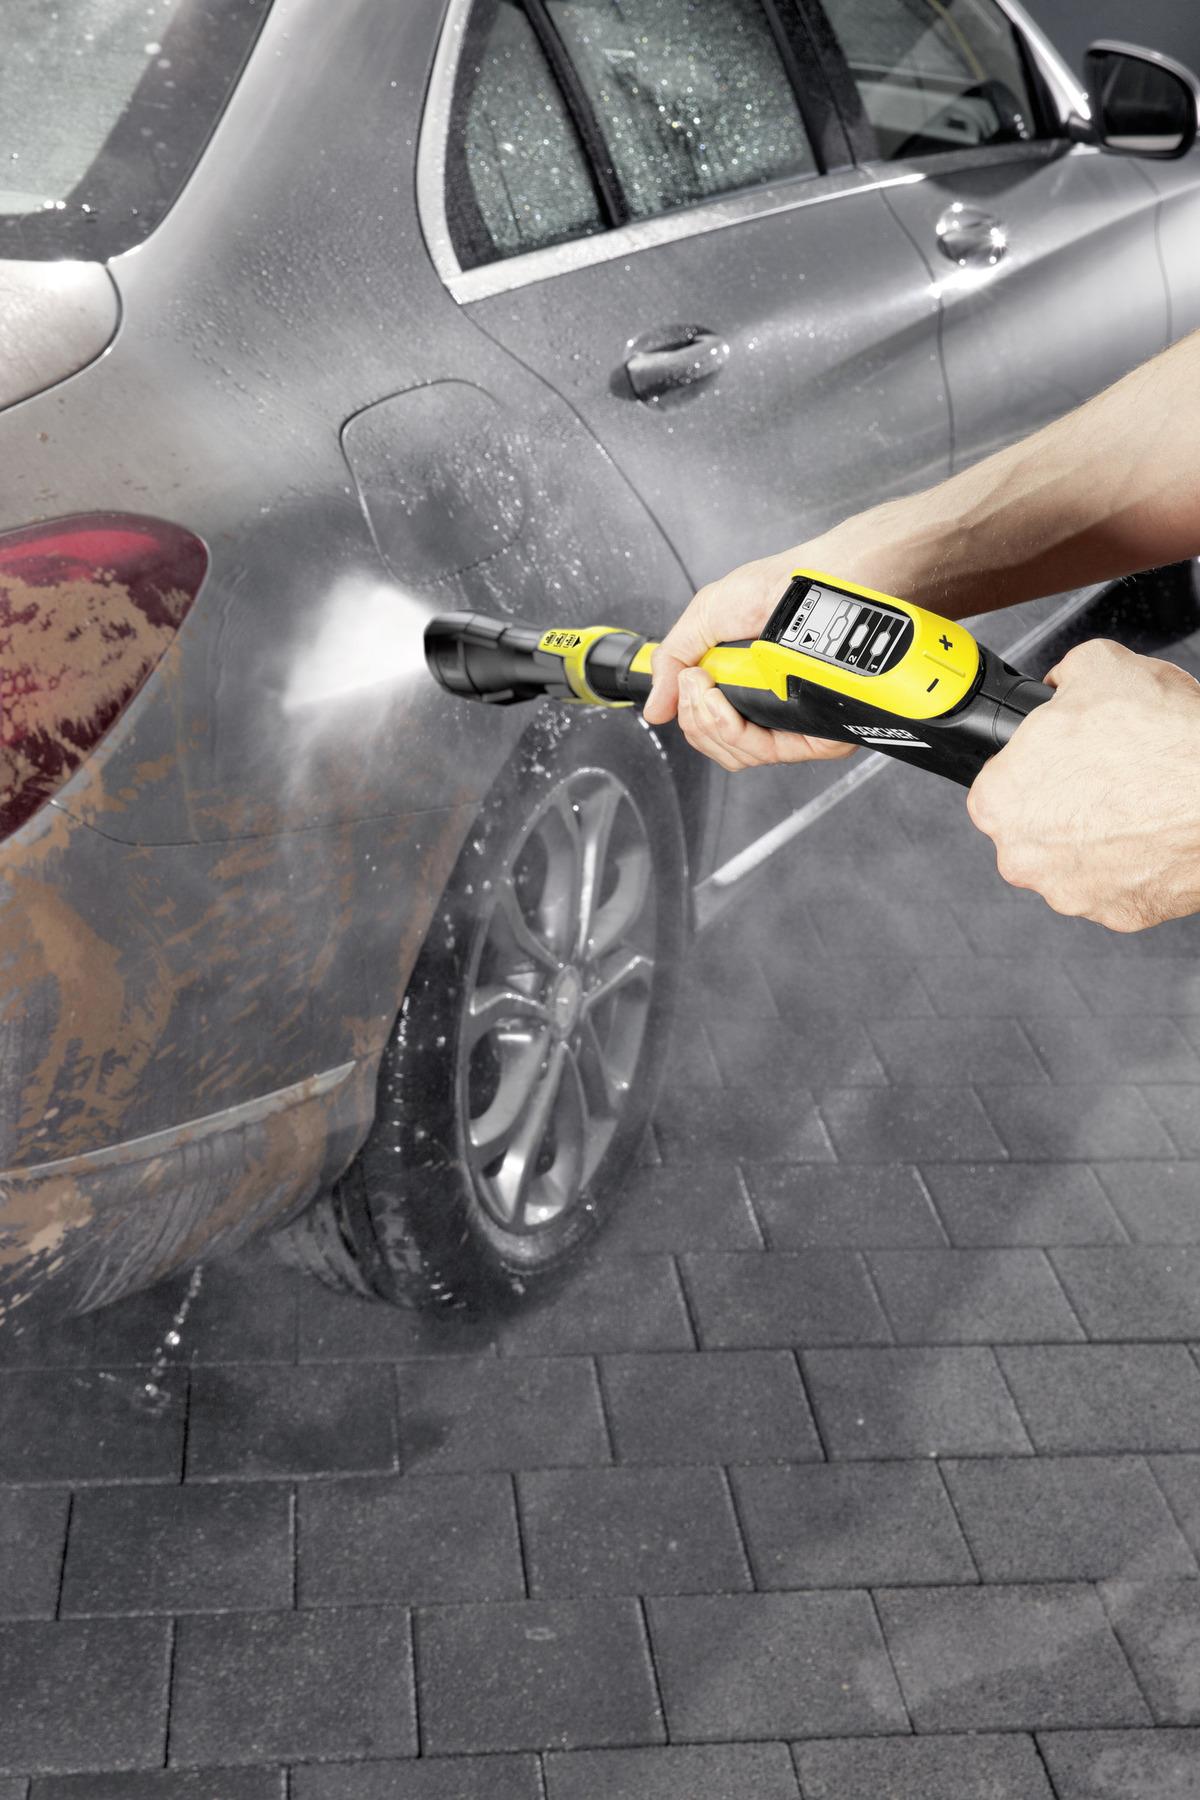 Karcher-K-7-Full-Control-Plus-Karcher-mašina-za-pranje-pod-visokim-pritiskom-Karcher-pranje-automobila